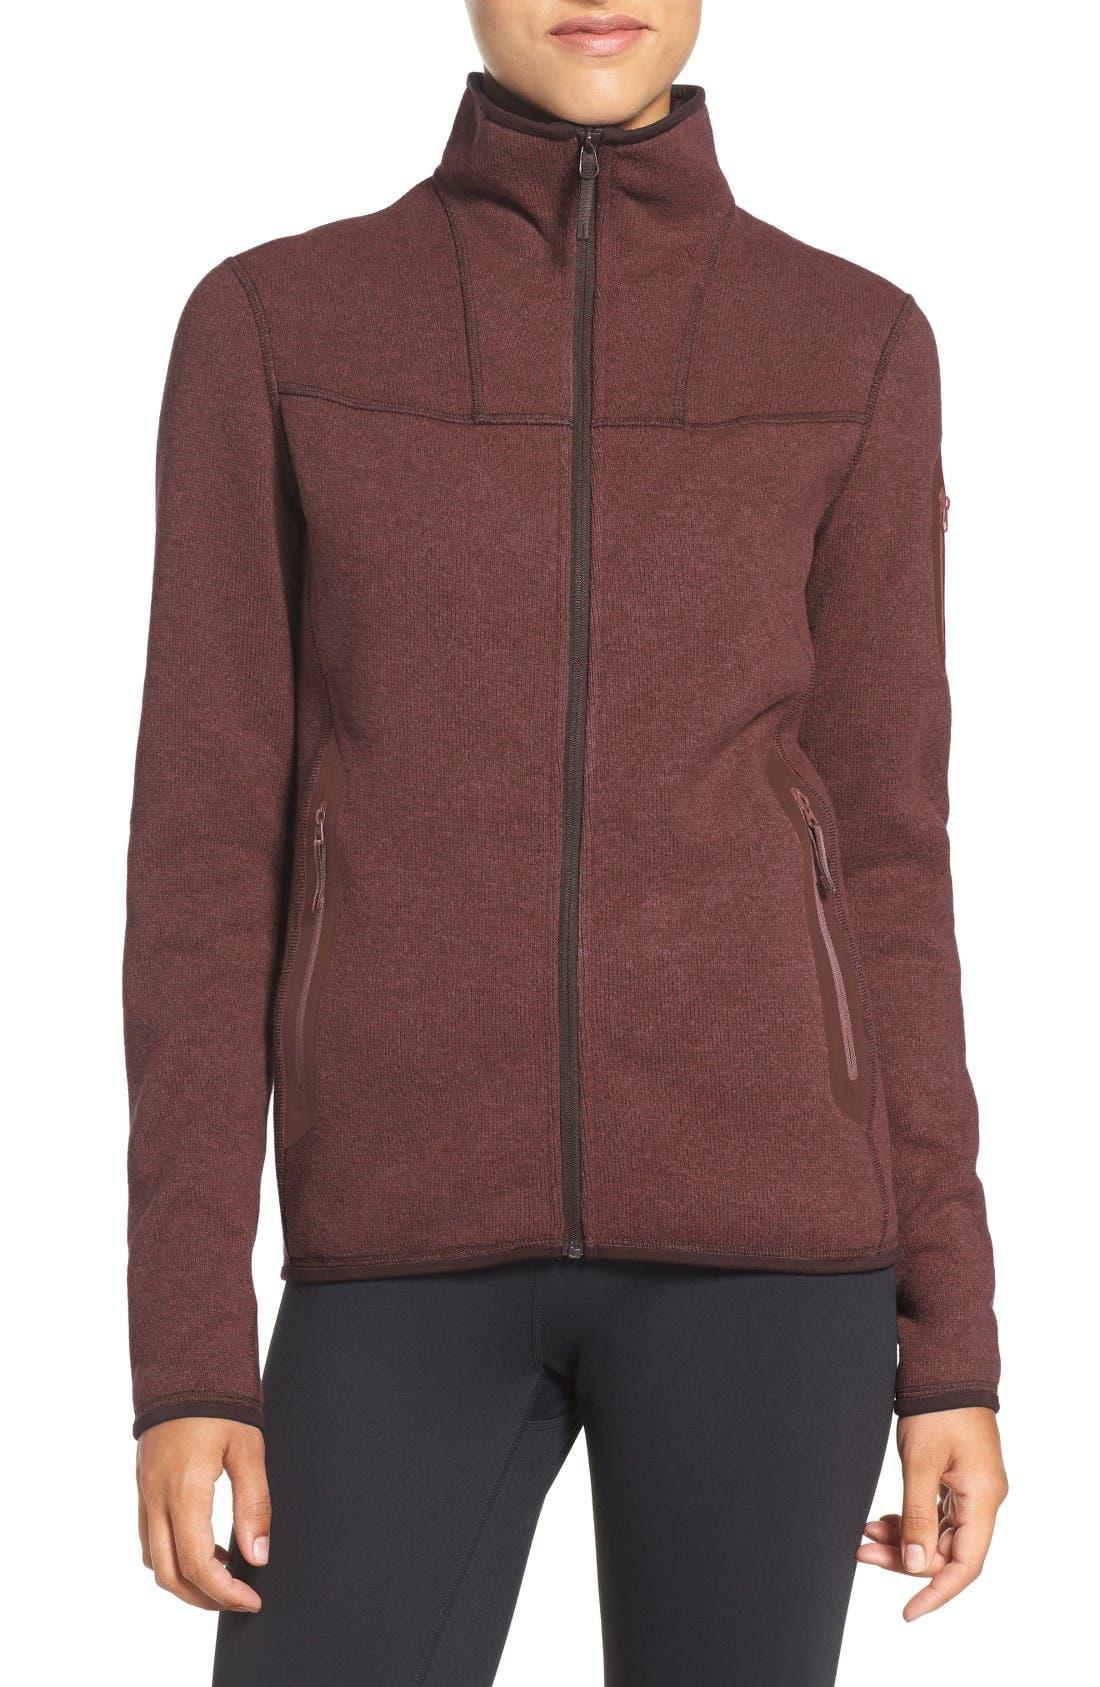 Covert Cardigan Fleece Jacket,                             Main thumbnail 1, color,                             200